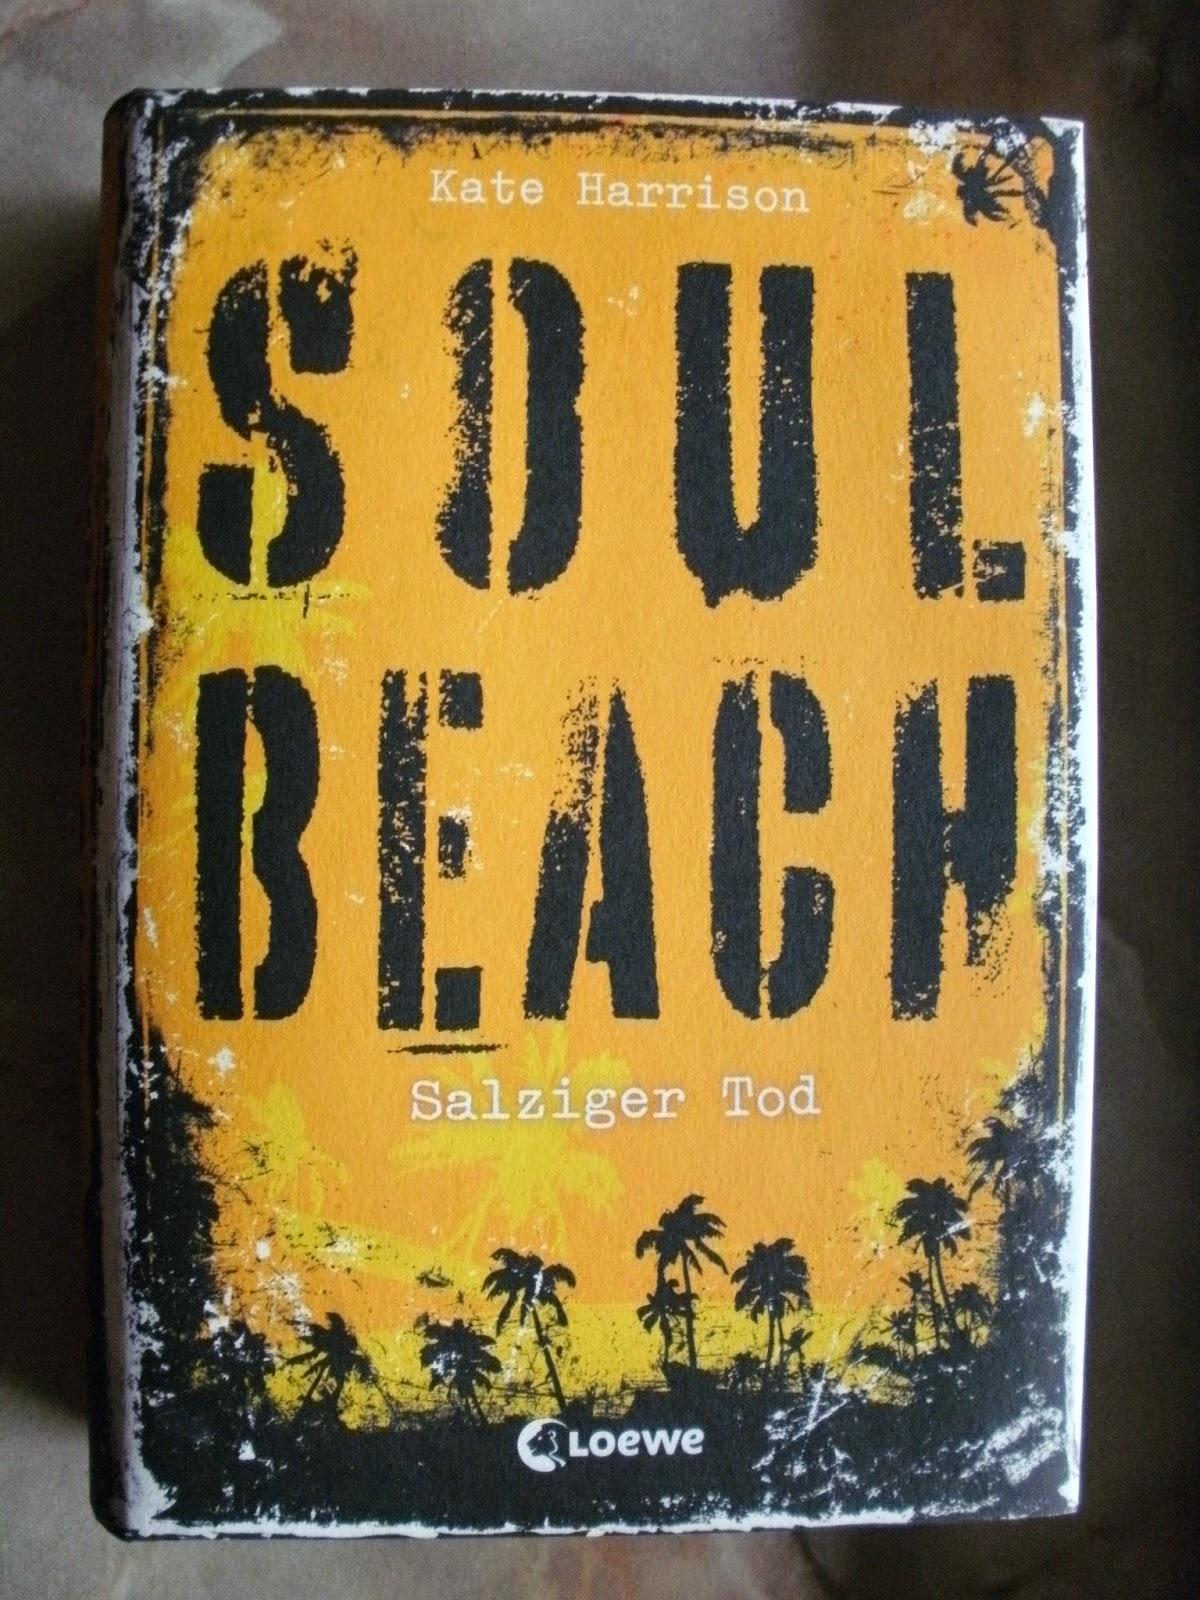 http://www.amazon.de/Soul-Beach-Salziger-Tod-Band/dp/378557388X/ref=sr_1_1?s=books&ie=UTF8&qid=1422566177&sr=1-1&keywords=Soul+beach+3